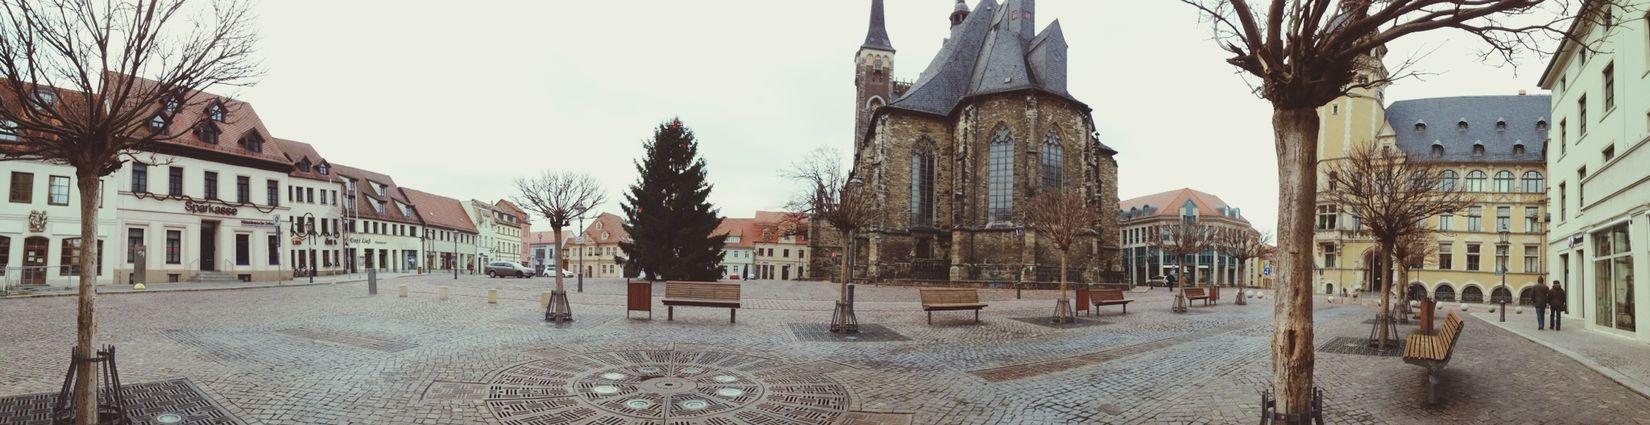 Dezember Stadt Kirche Taking Photos